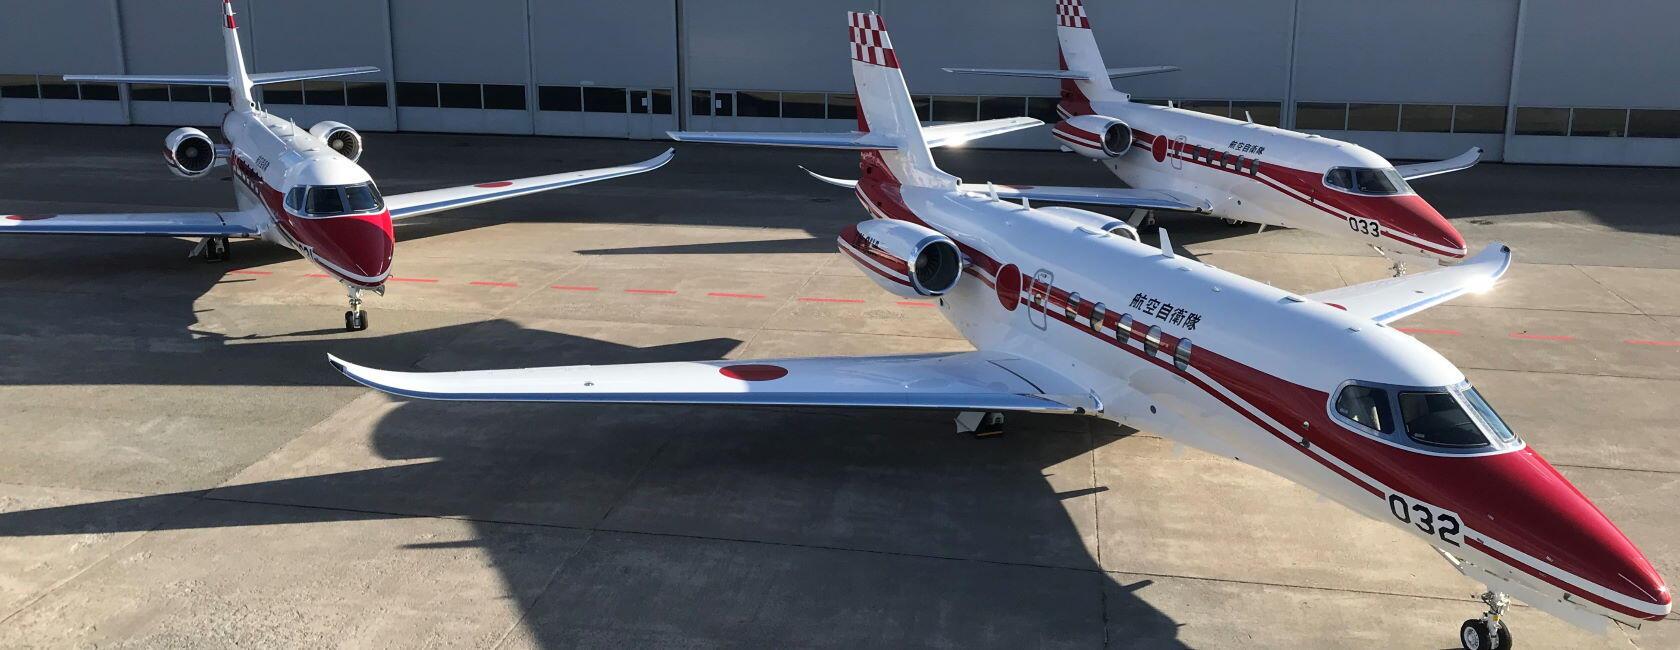 JASDF Flight Inspection Latitudes Enter Service